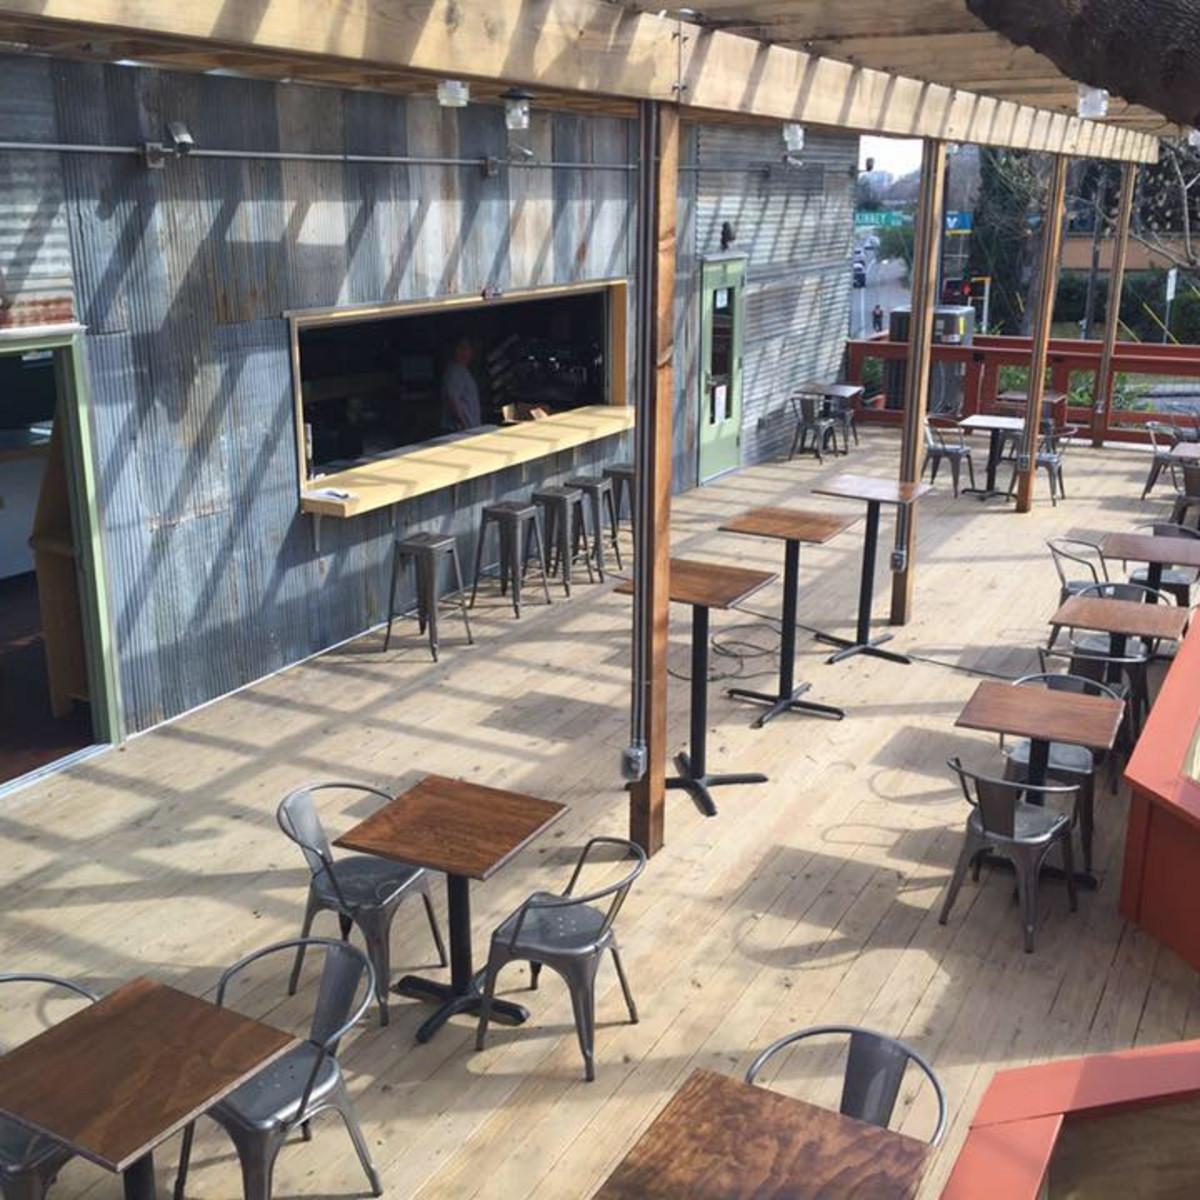 SquareRut Kava Bar patio after completion